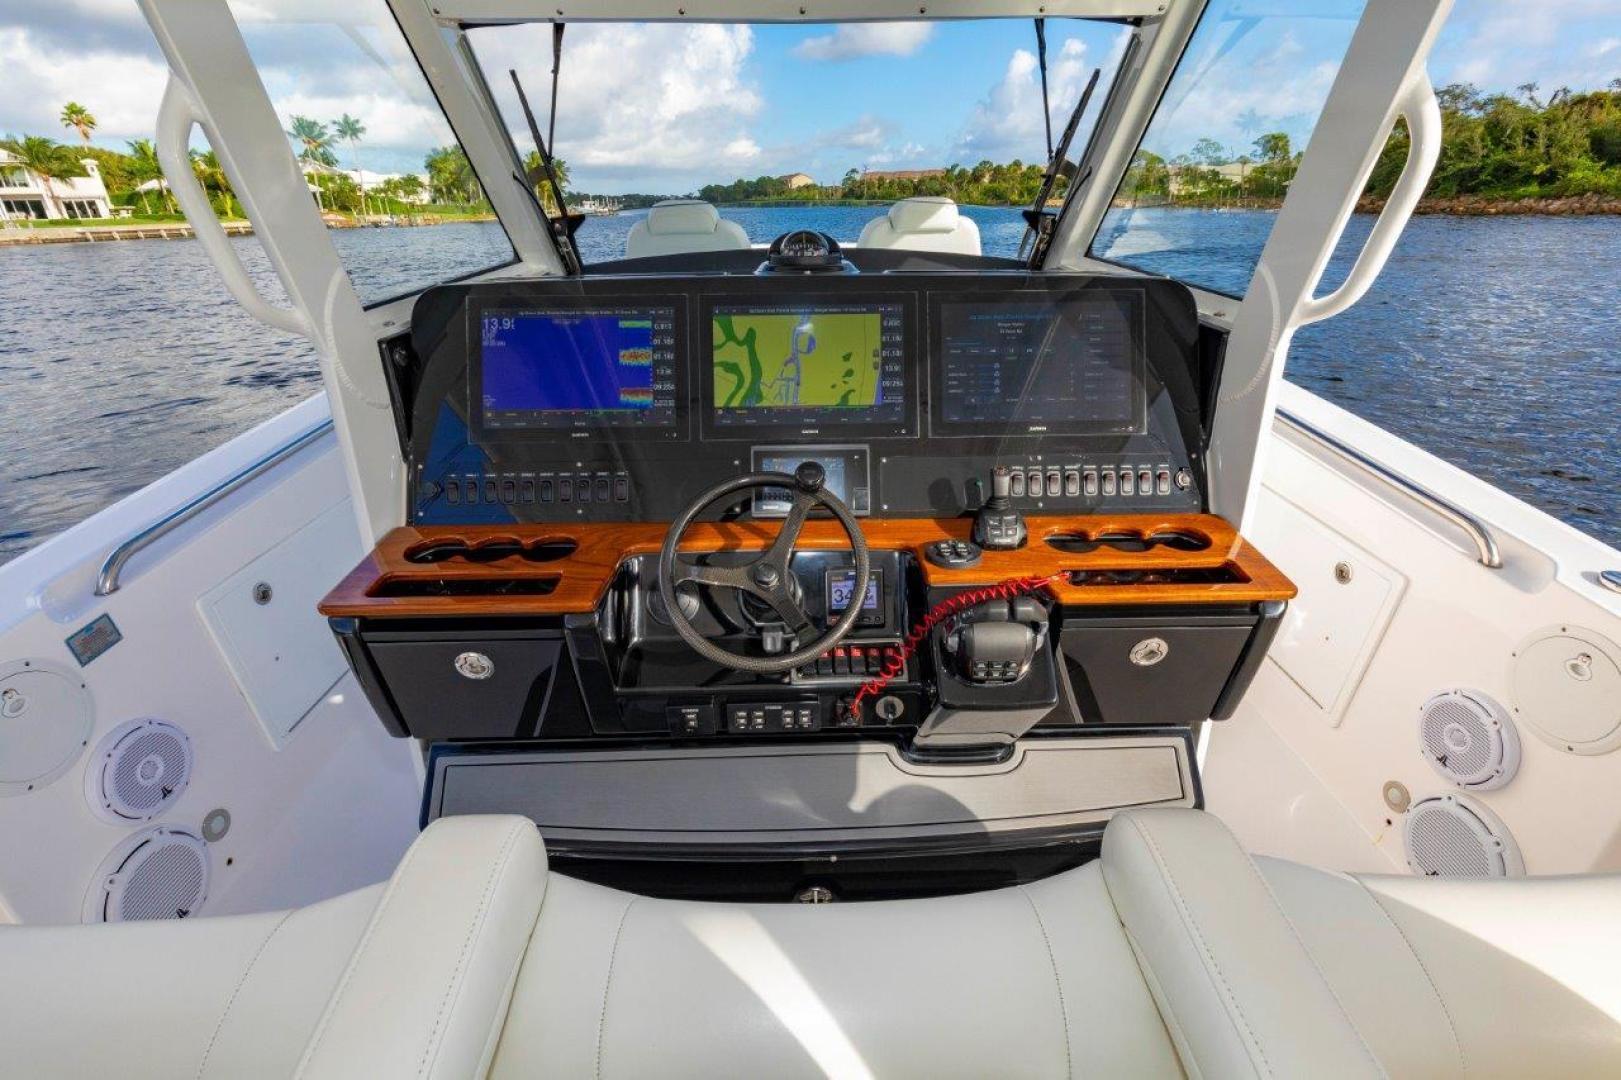 Everglades-435 Center Console 2019-Bahama Papa Palm Beach Gardens-Florida-United States-Helm-1570492 | Thumbnail